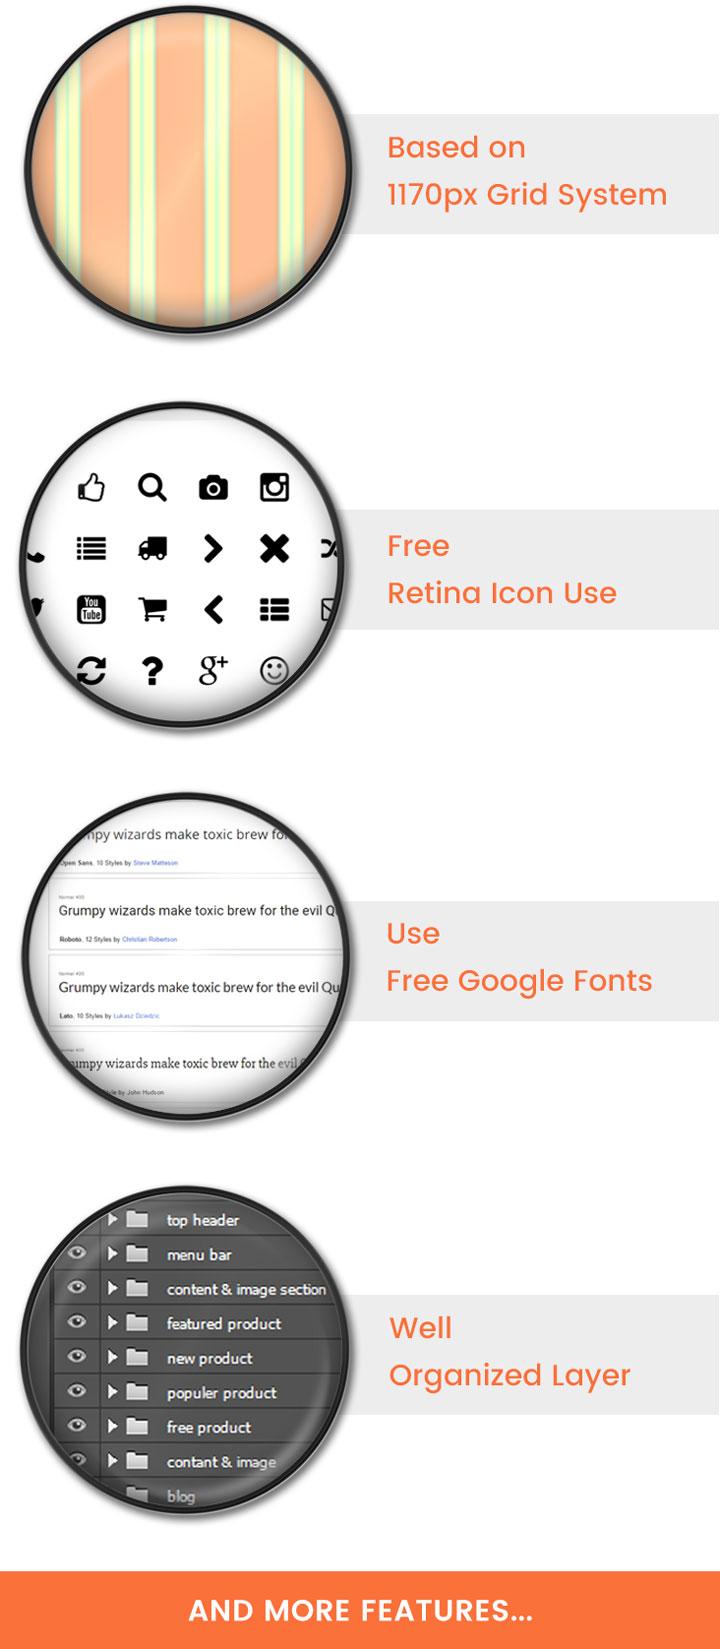 themetidy-Foot---Creative-eCommerce-Shop-PSD-Template-description-feature-list-image